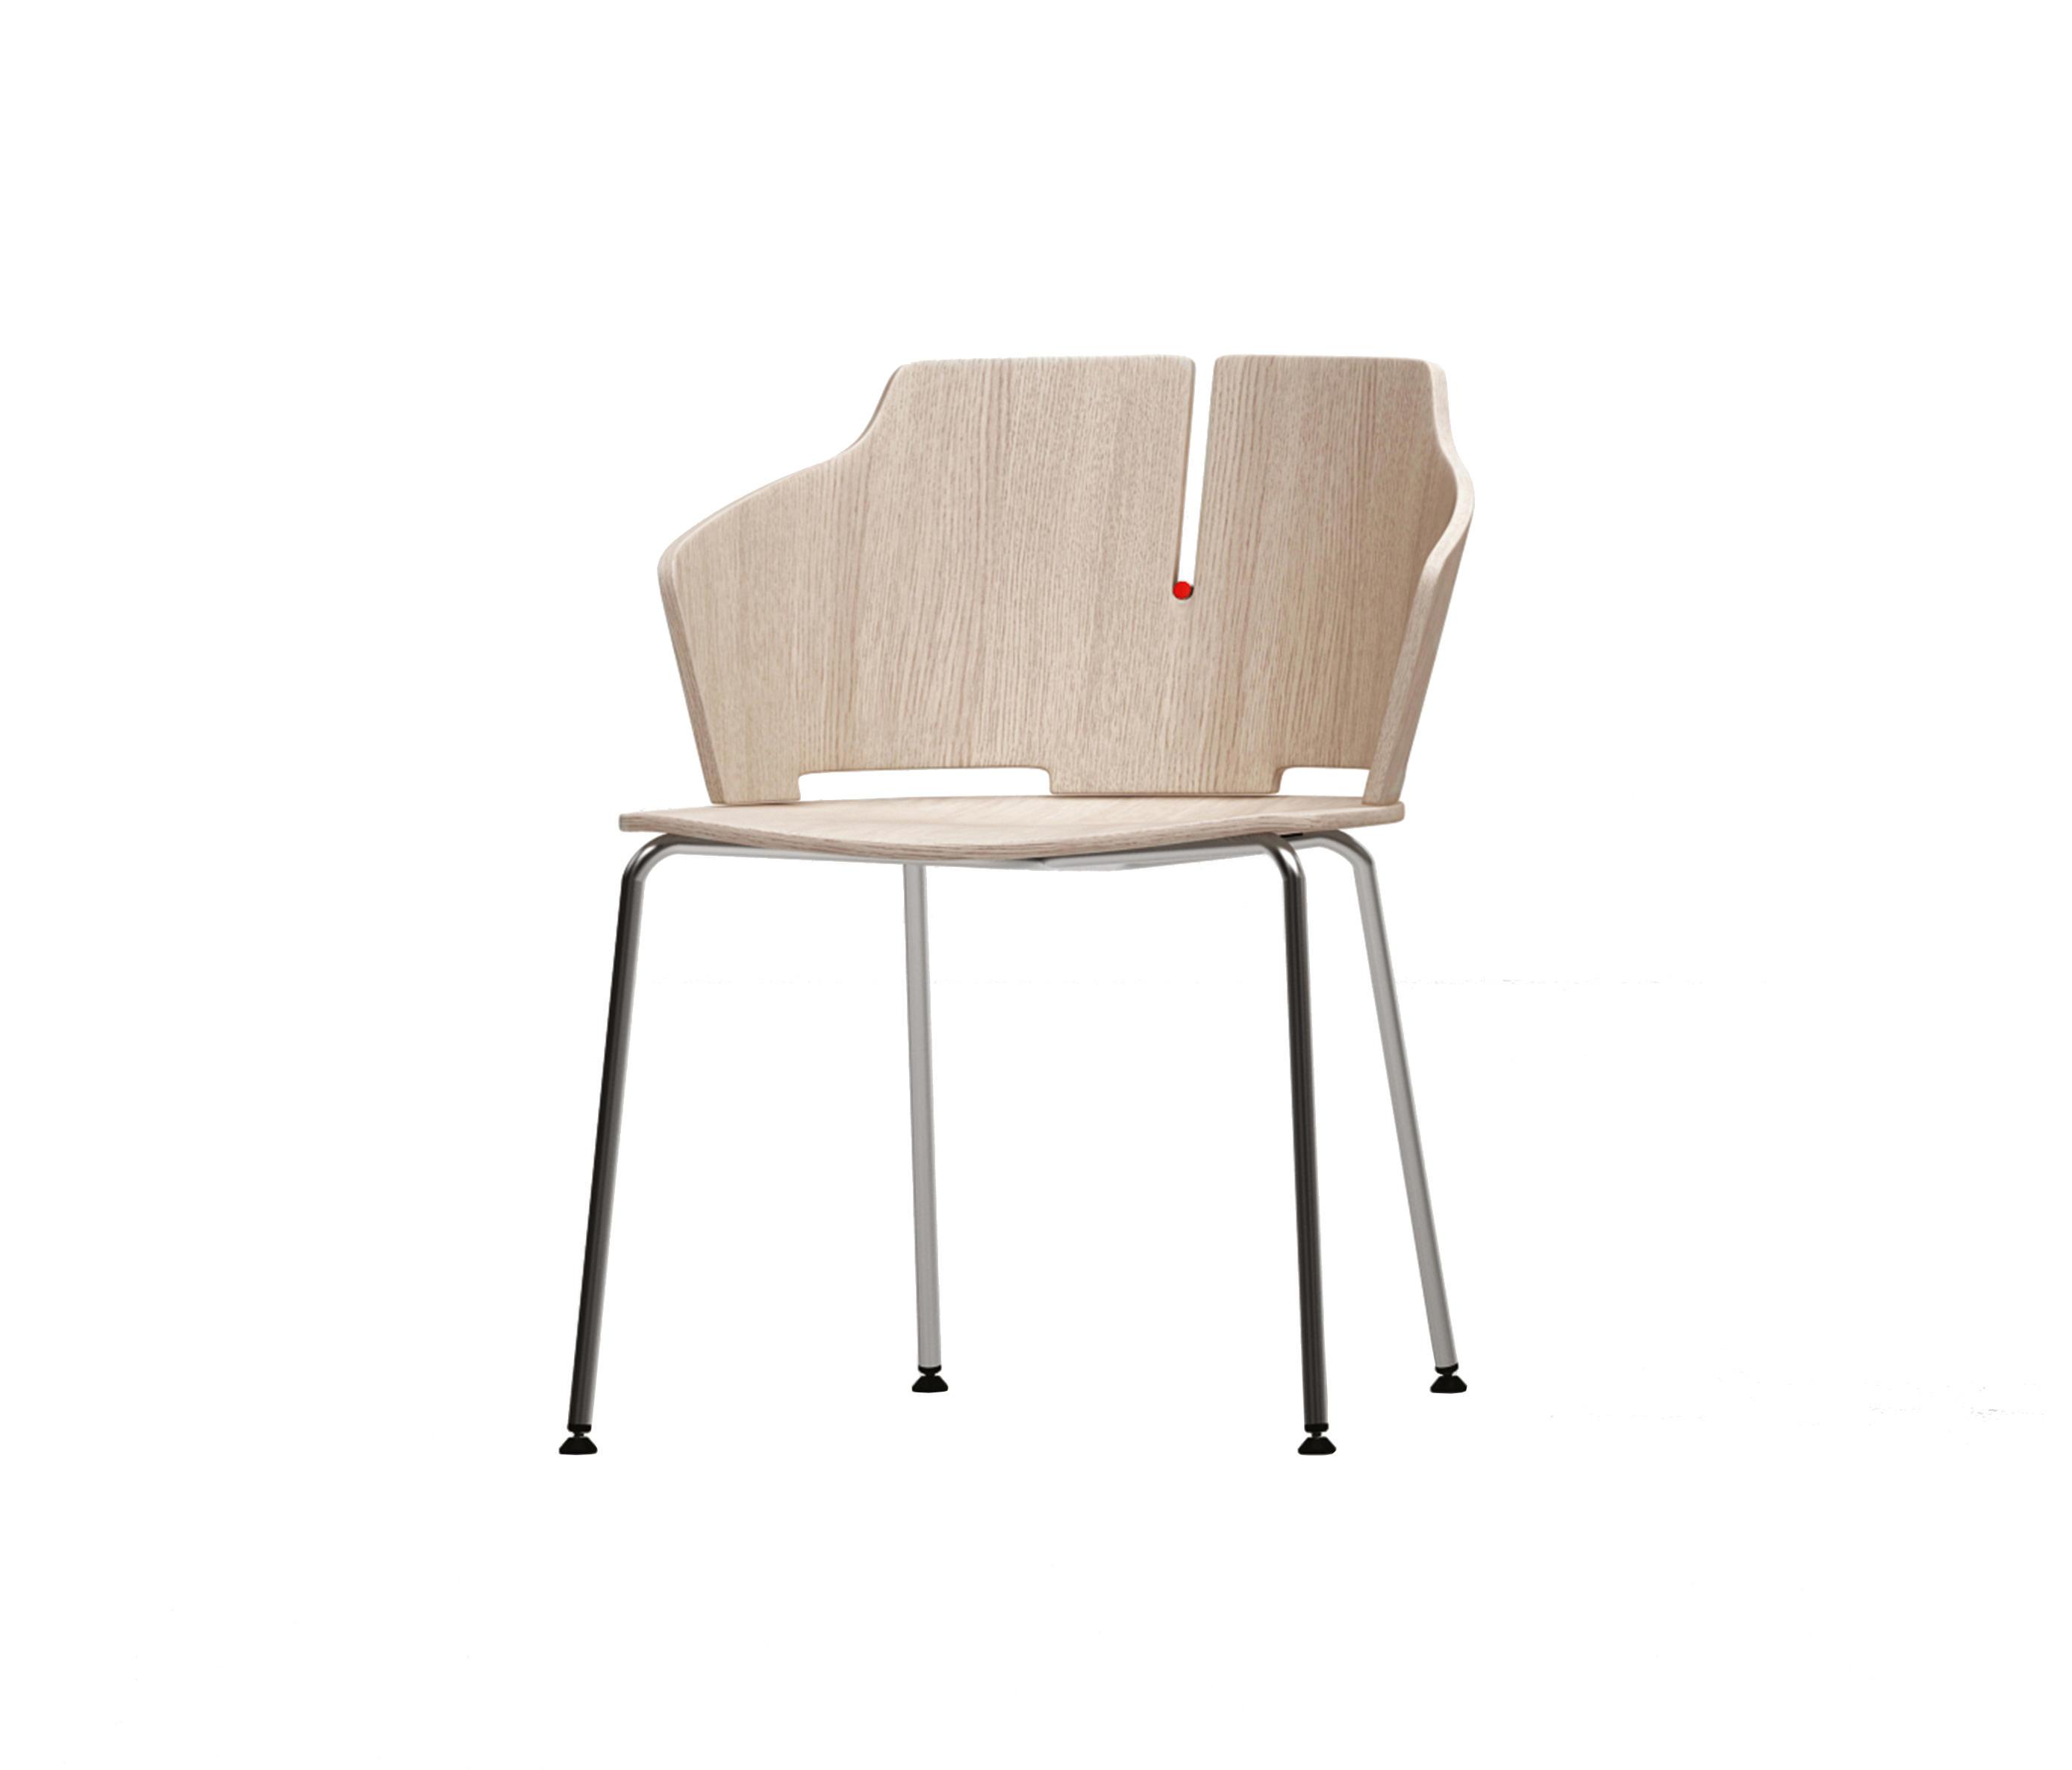 Beau Prima PR1 By Luxy | Chairs